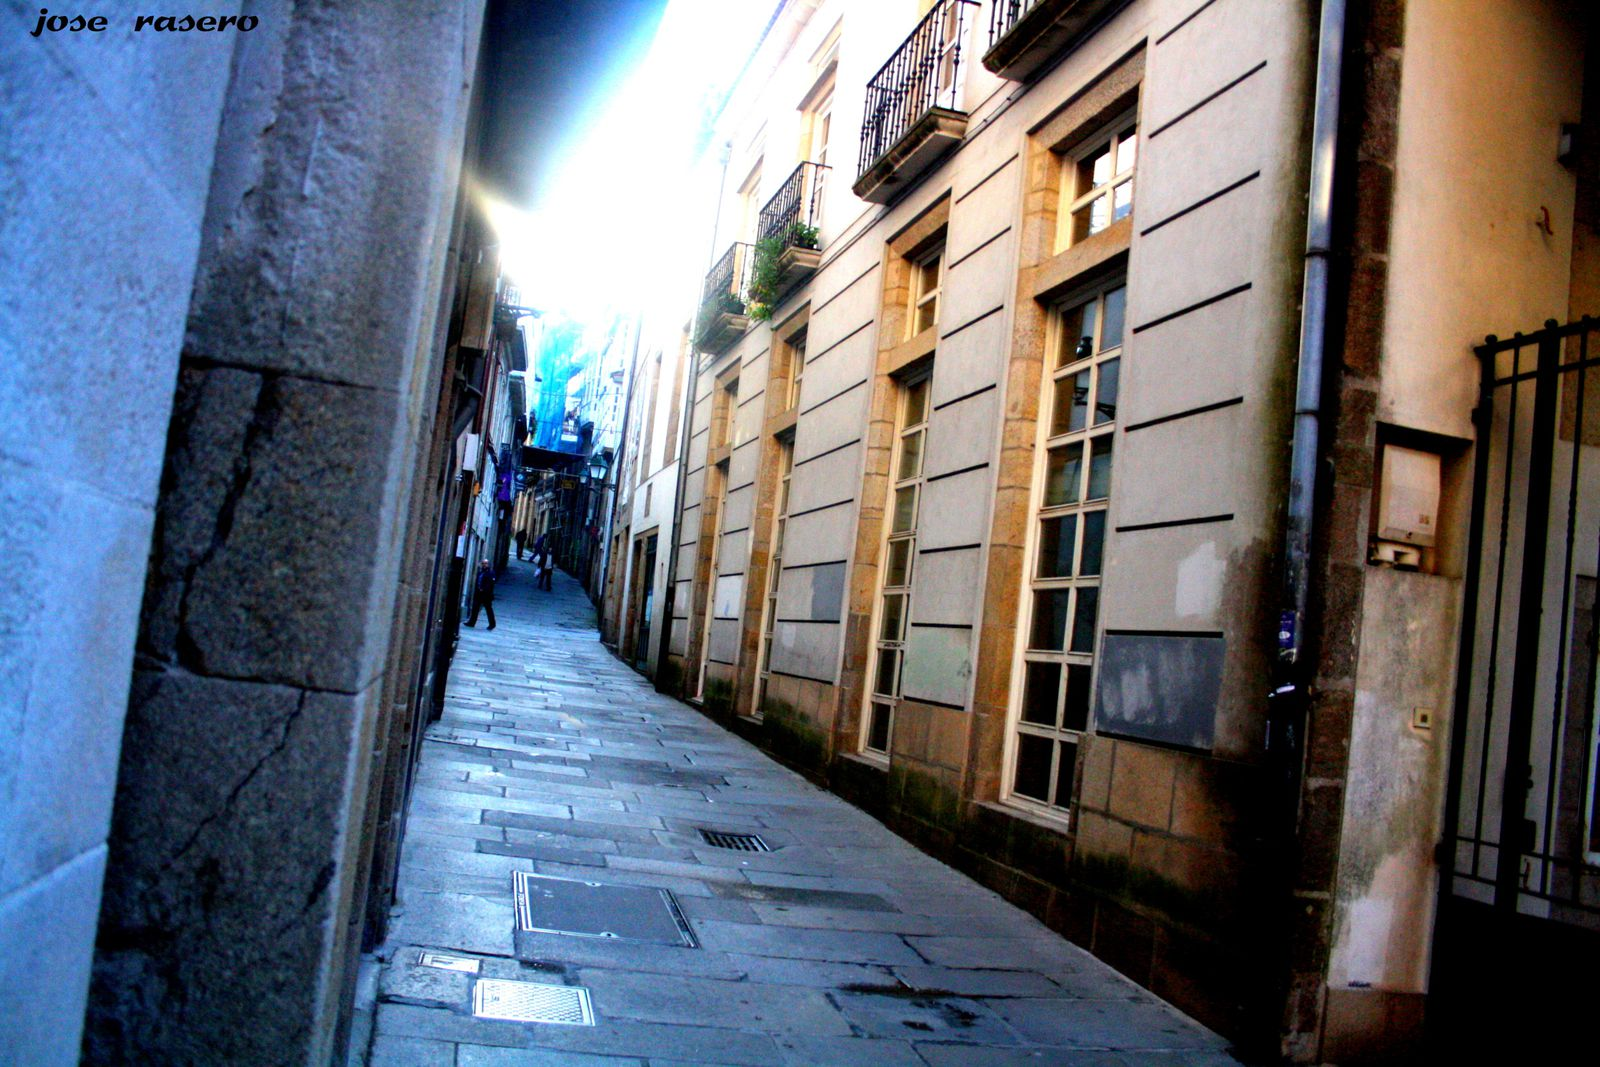 'Santiago de Compostela'